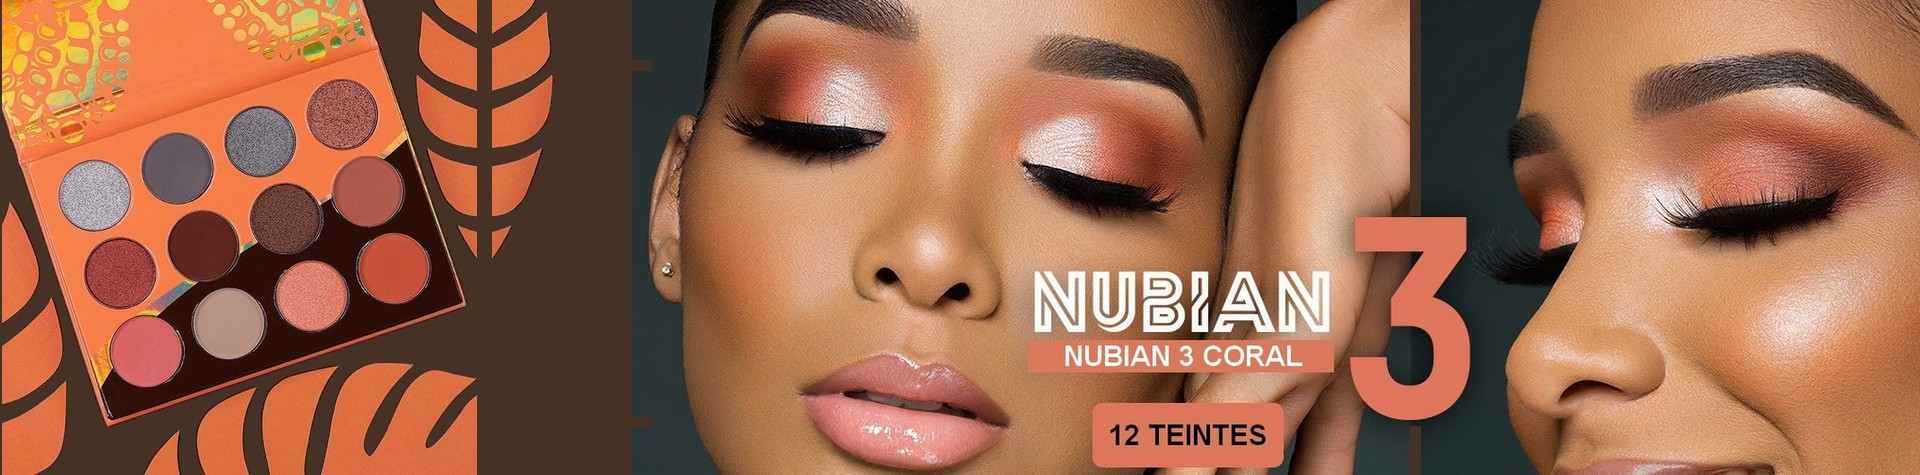 JUVIAS PLACE NUBIAN 3 CORAL